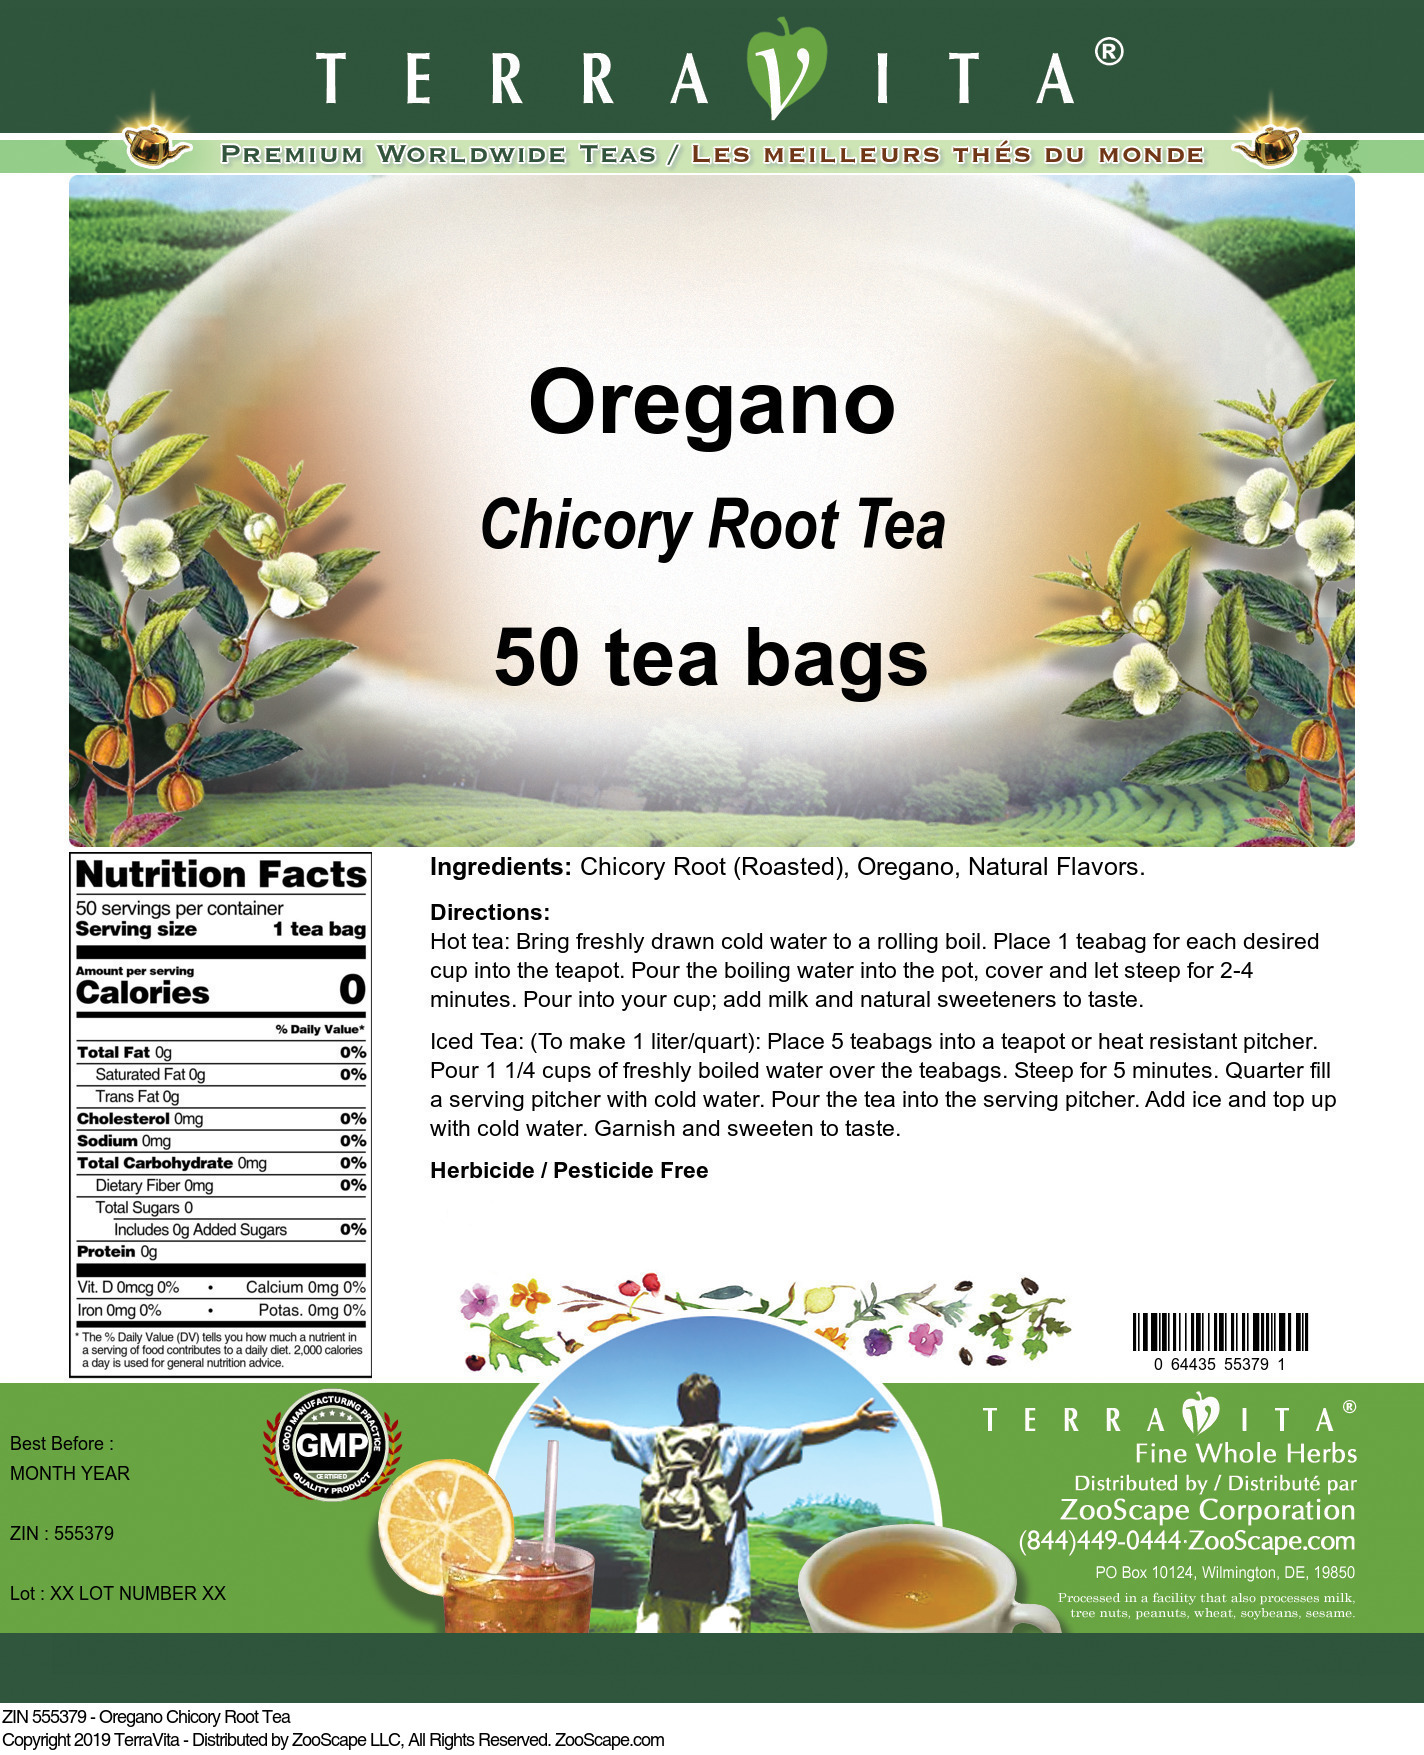 Oregano Chicory Root Tea